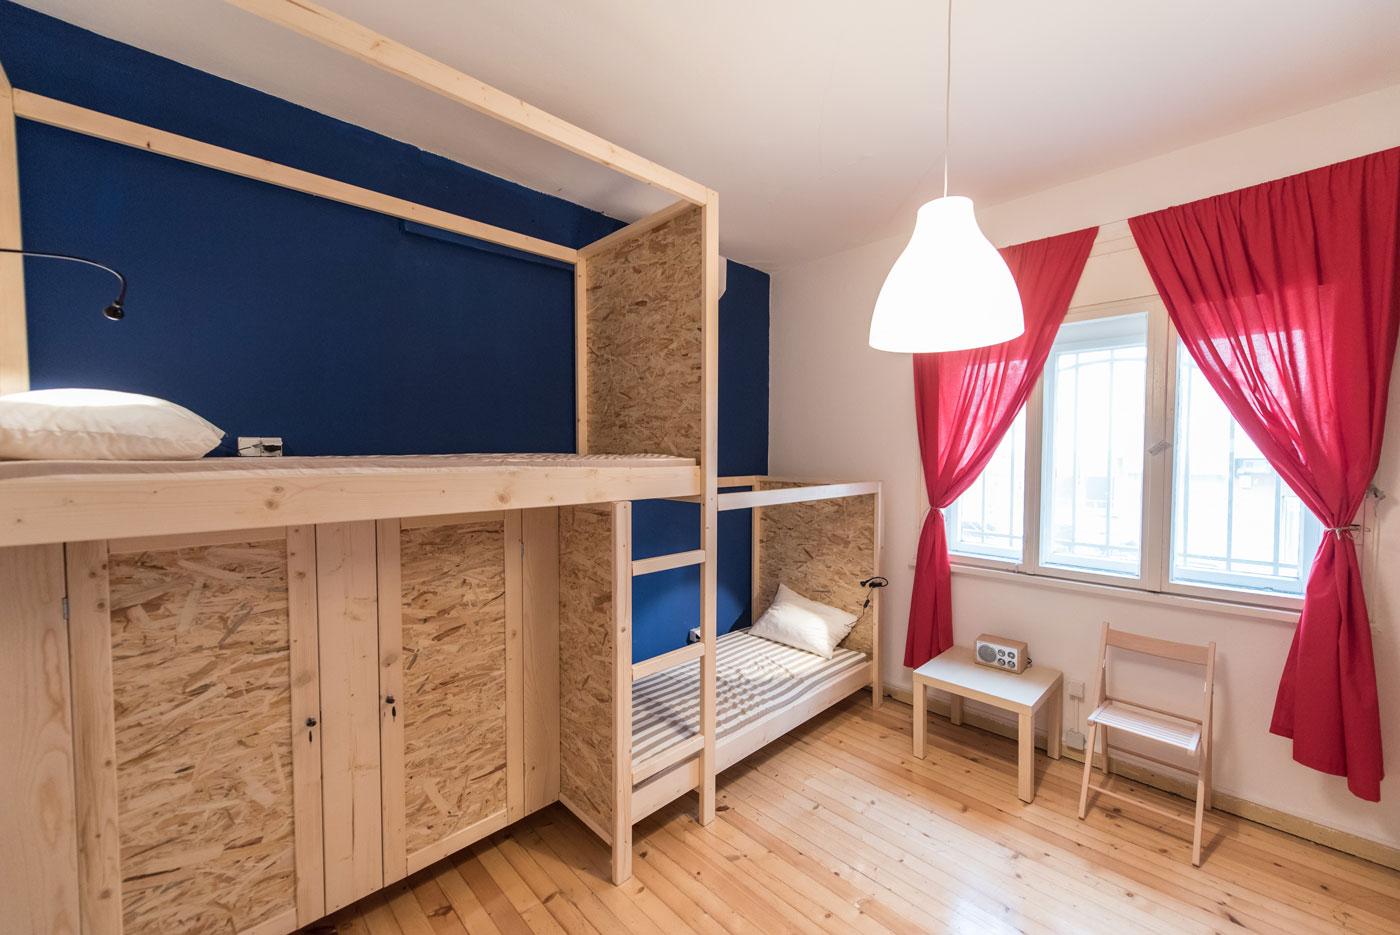 Single Bed In 4 Beds Bedroom